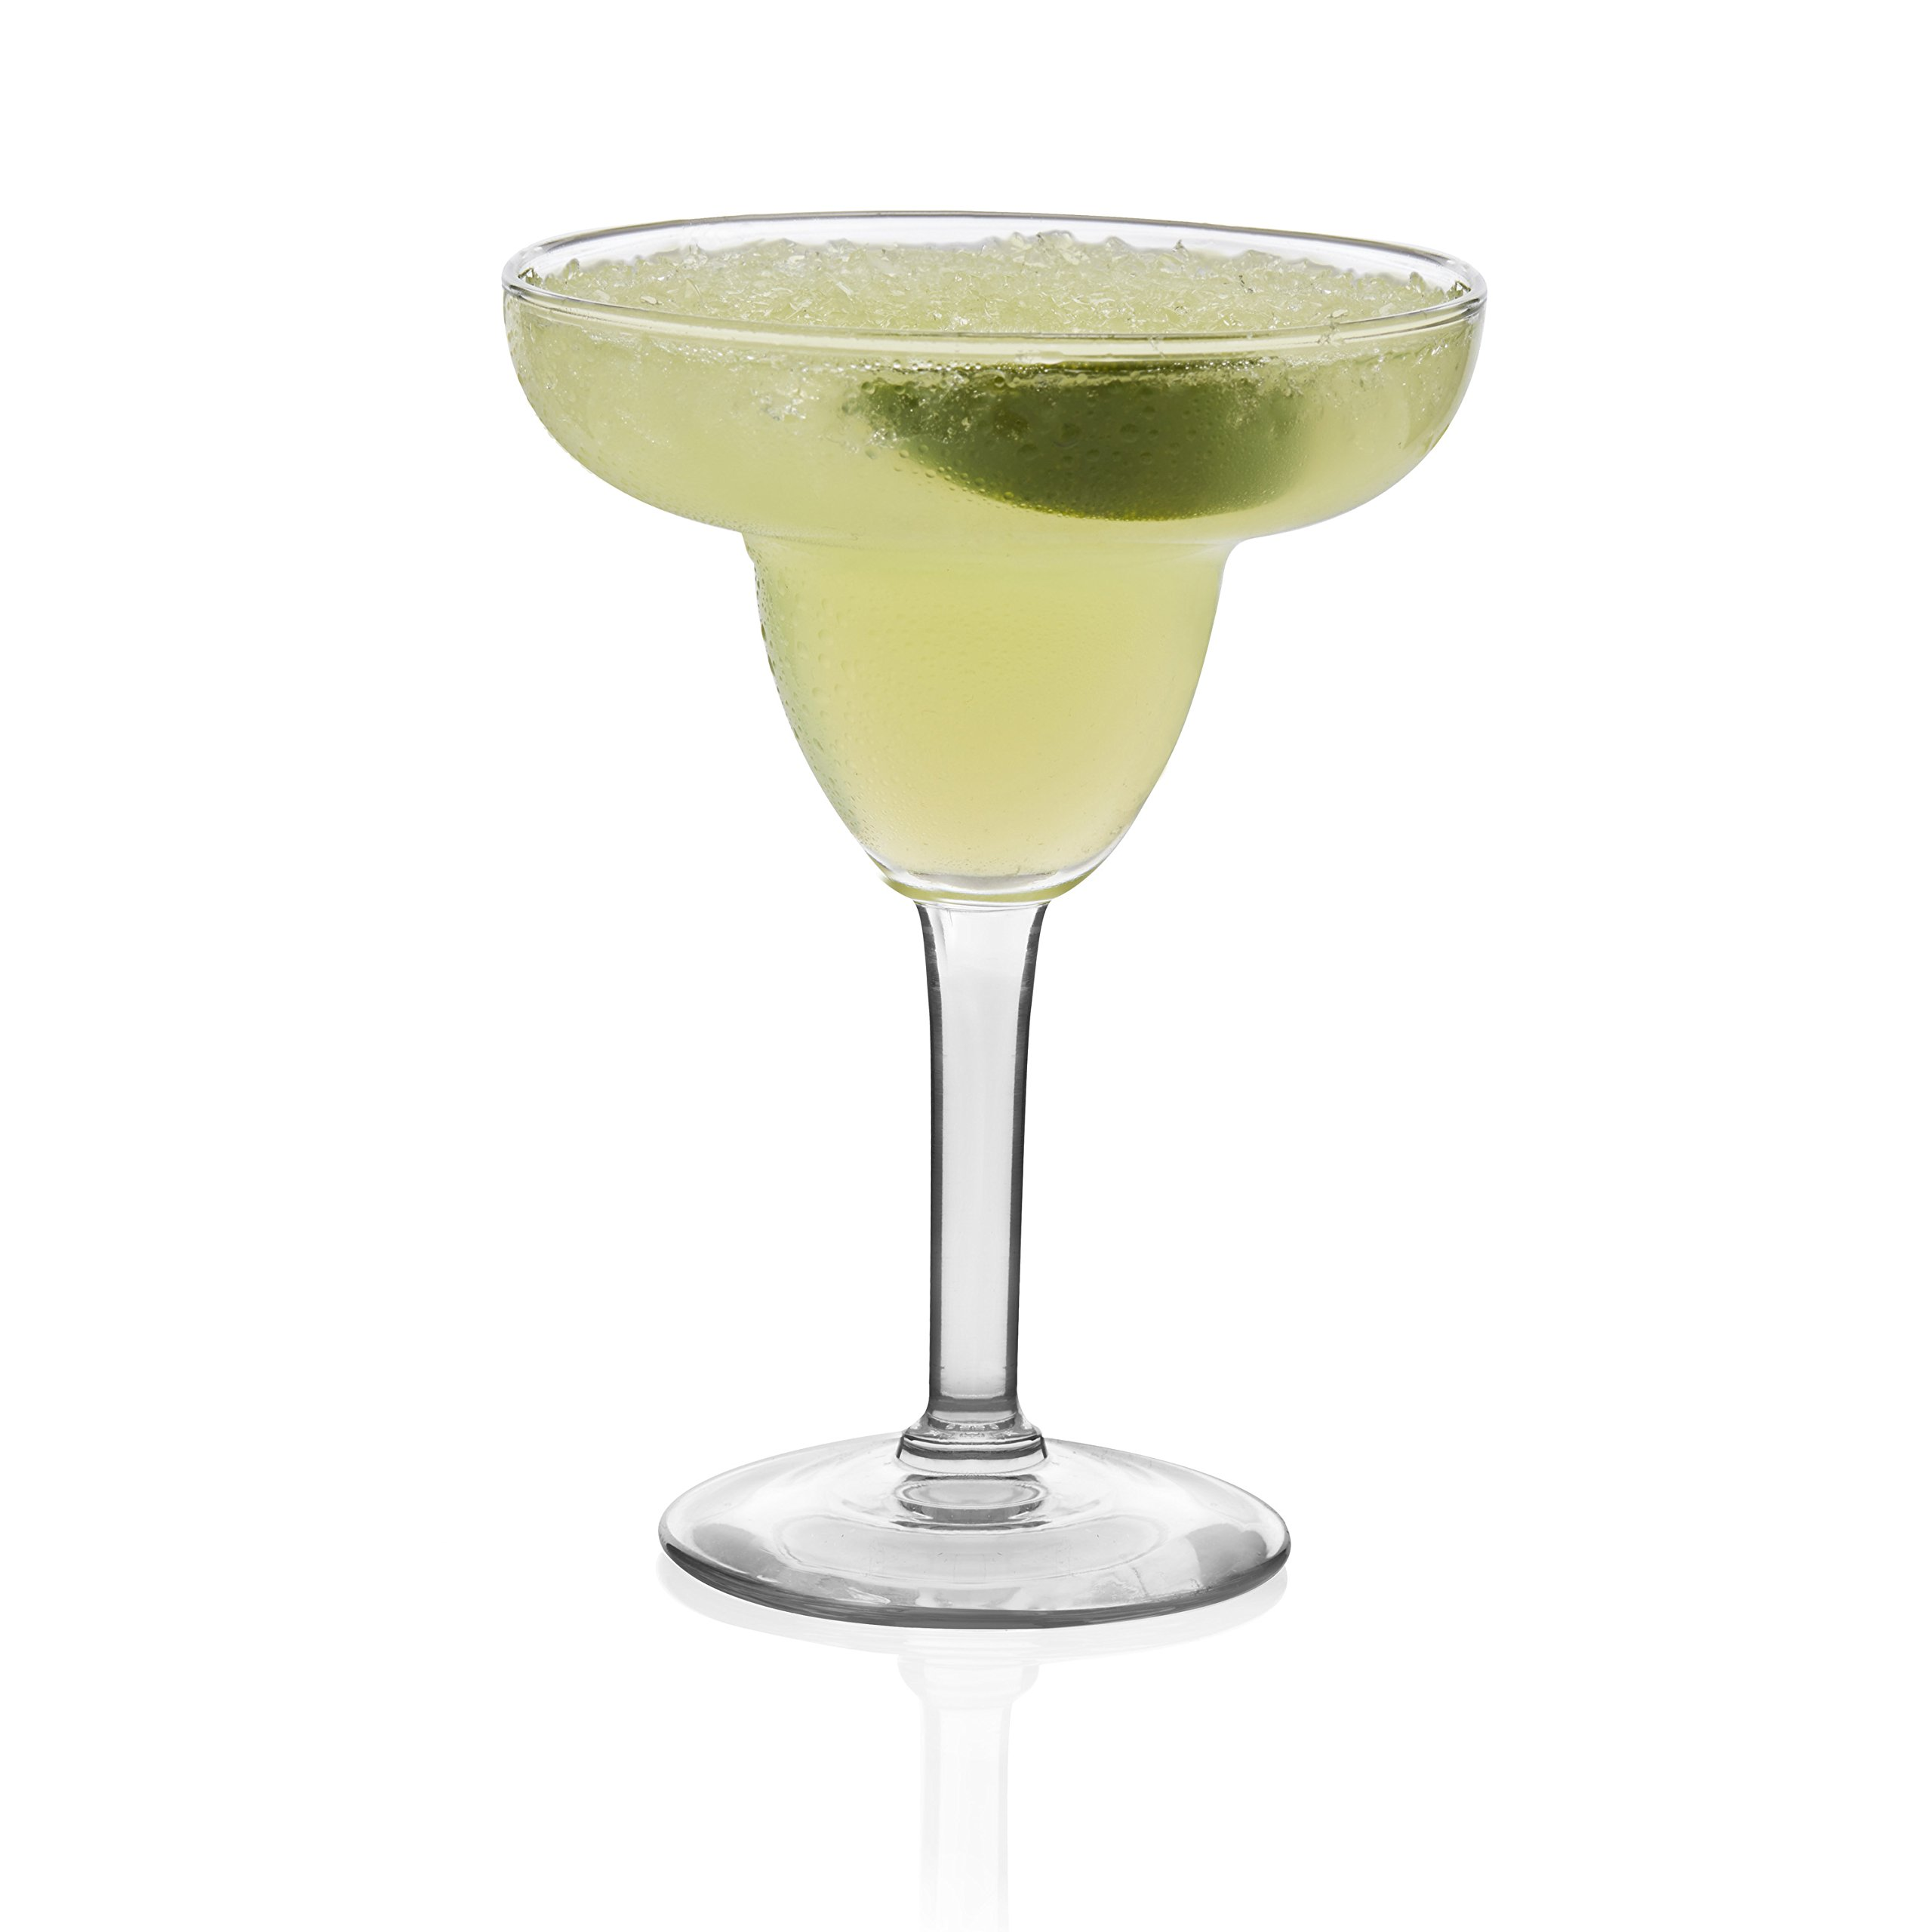 Libbey Margarita Party 12-piece Glass Set